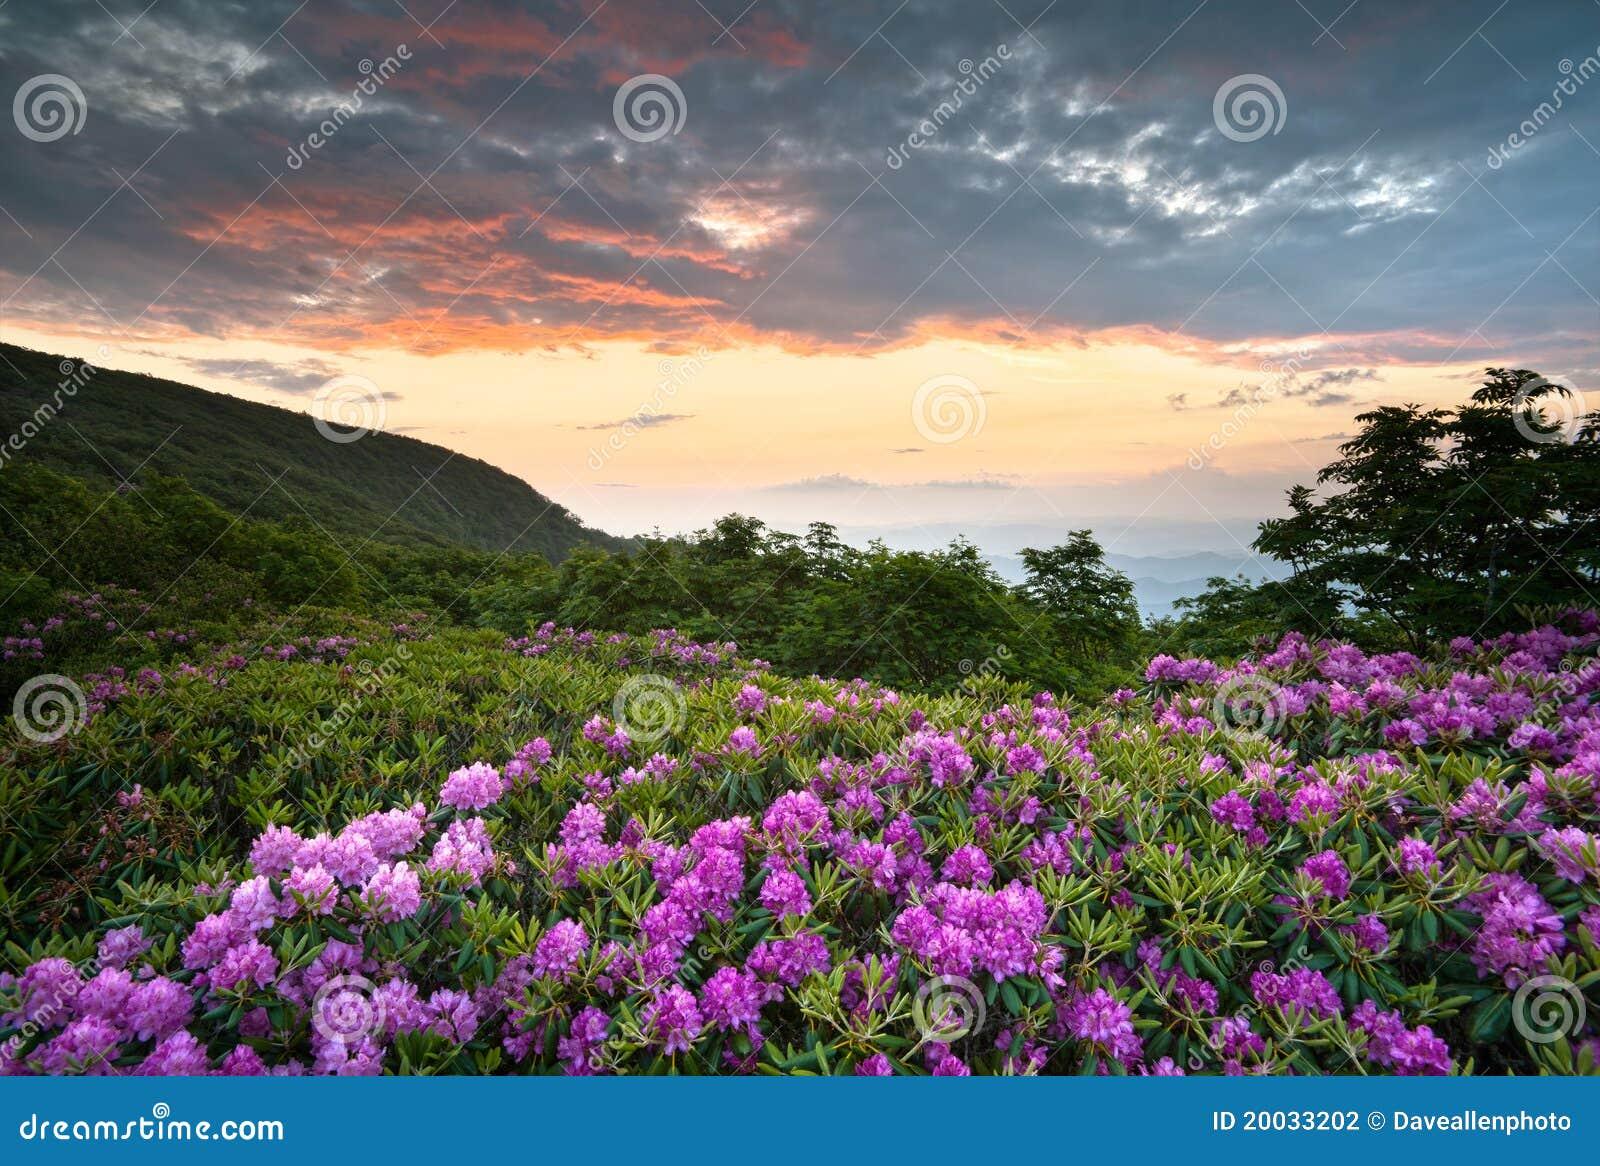 Blue Ridge Parkway Mountains Sunset Spring Flowers